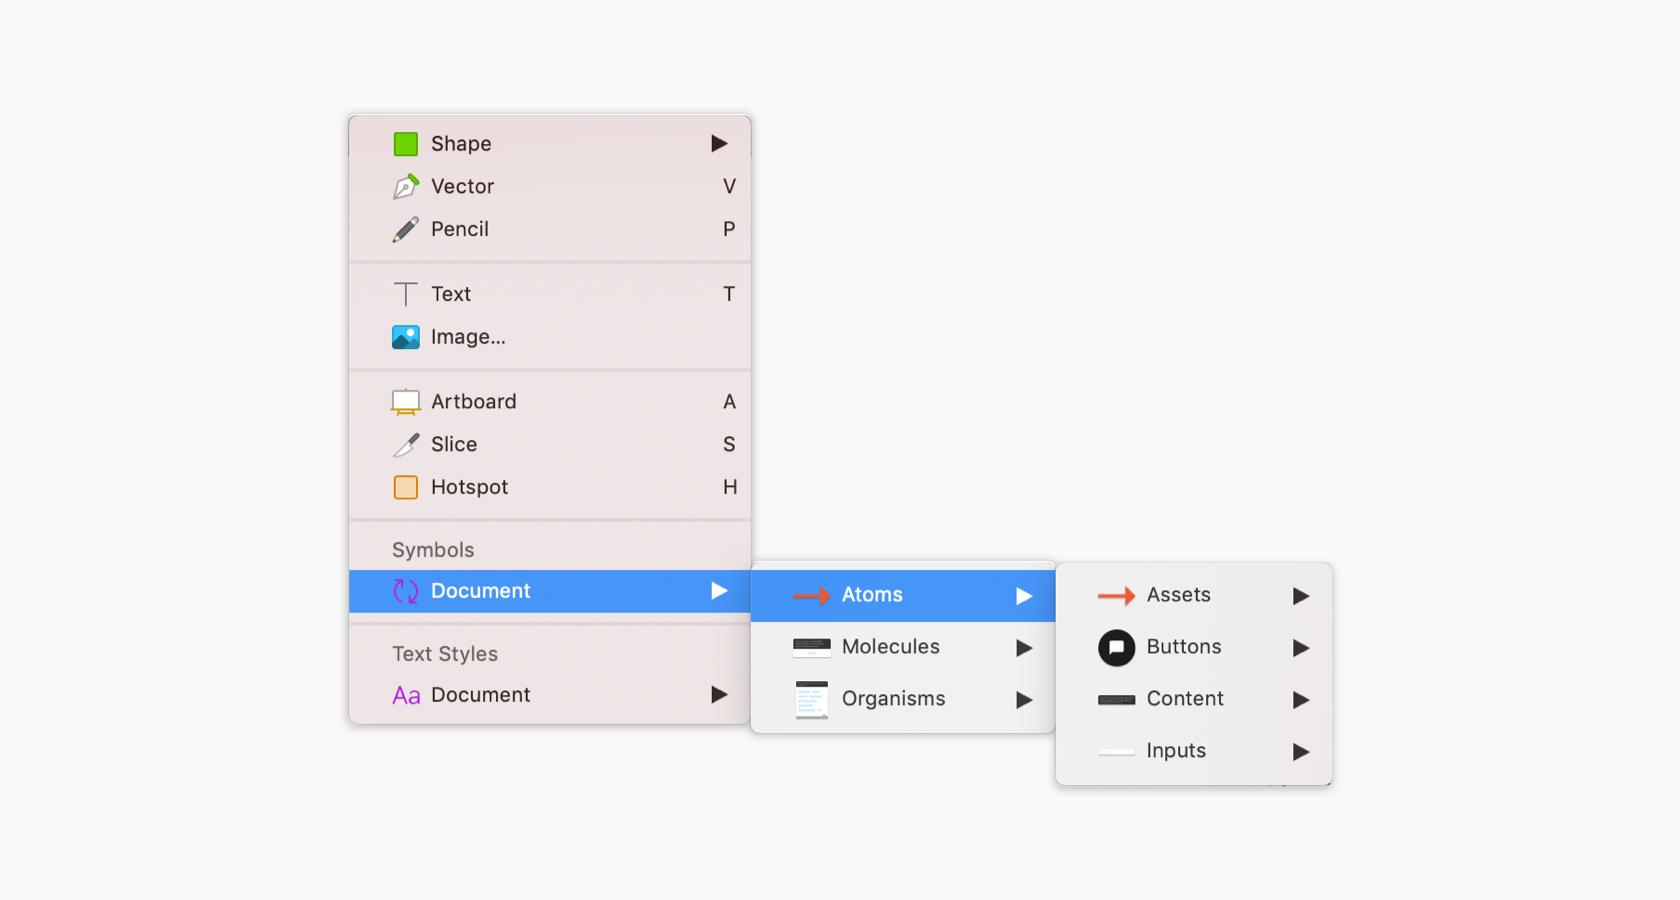 The insert panel menu in Sketch for Atomic Design instantiation